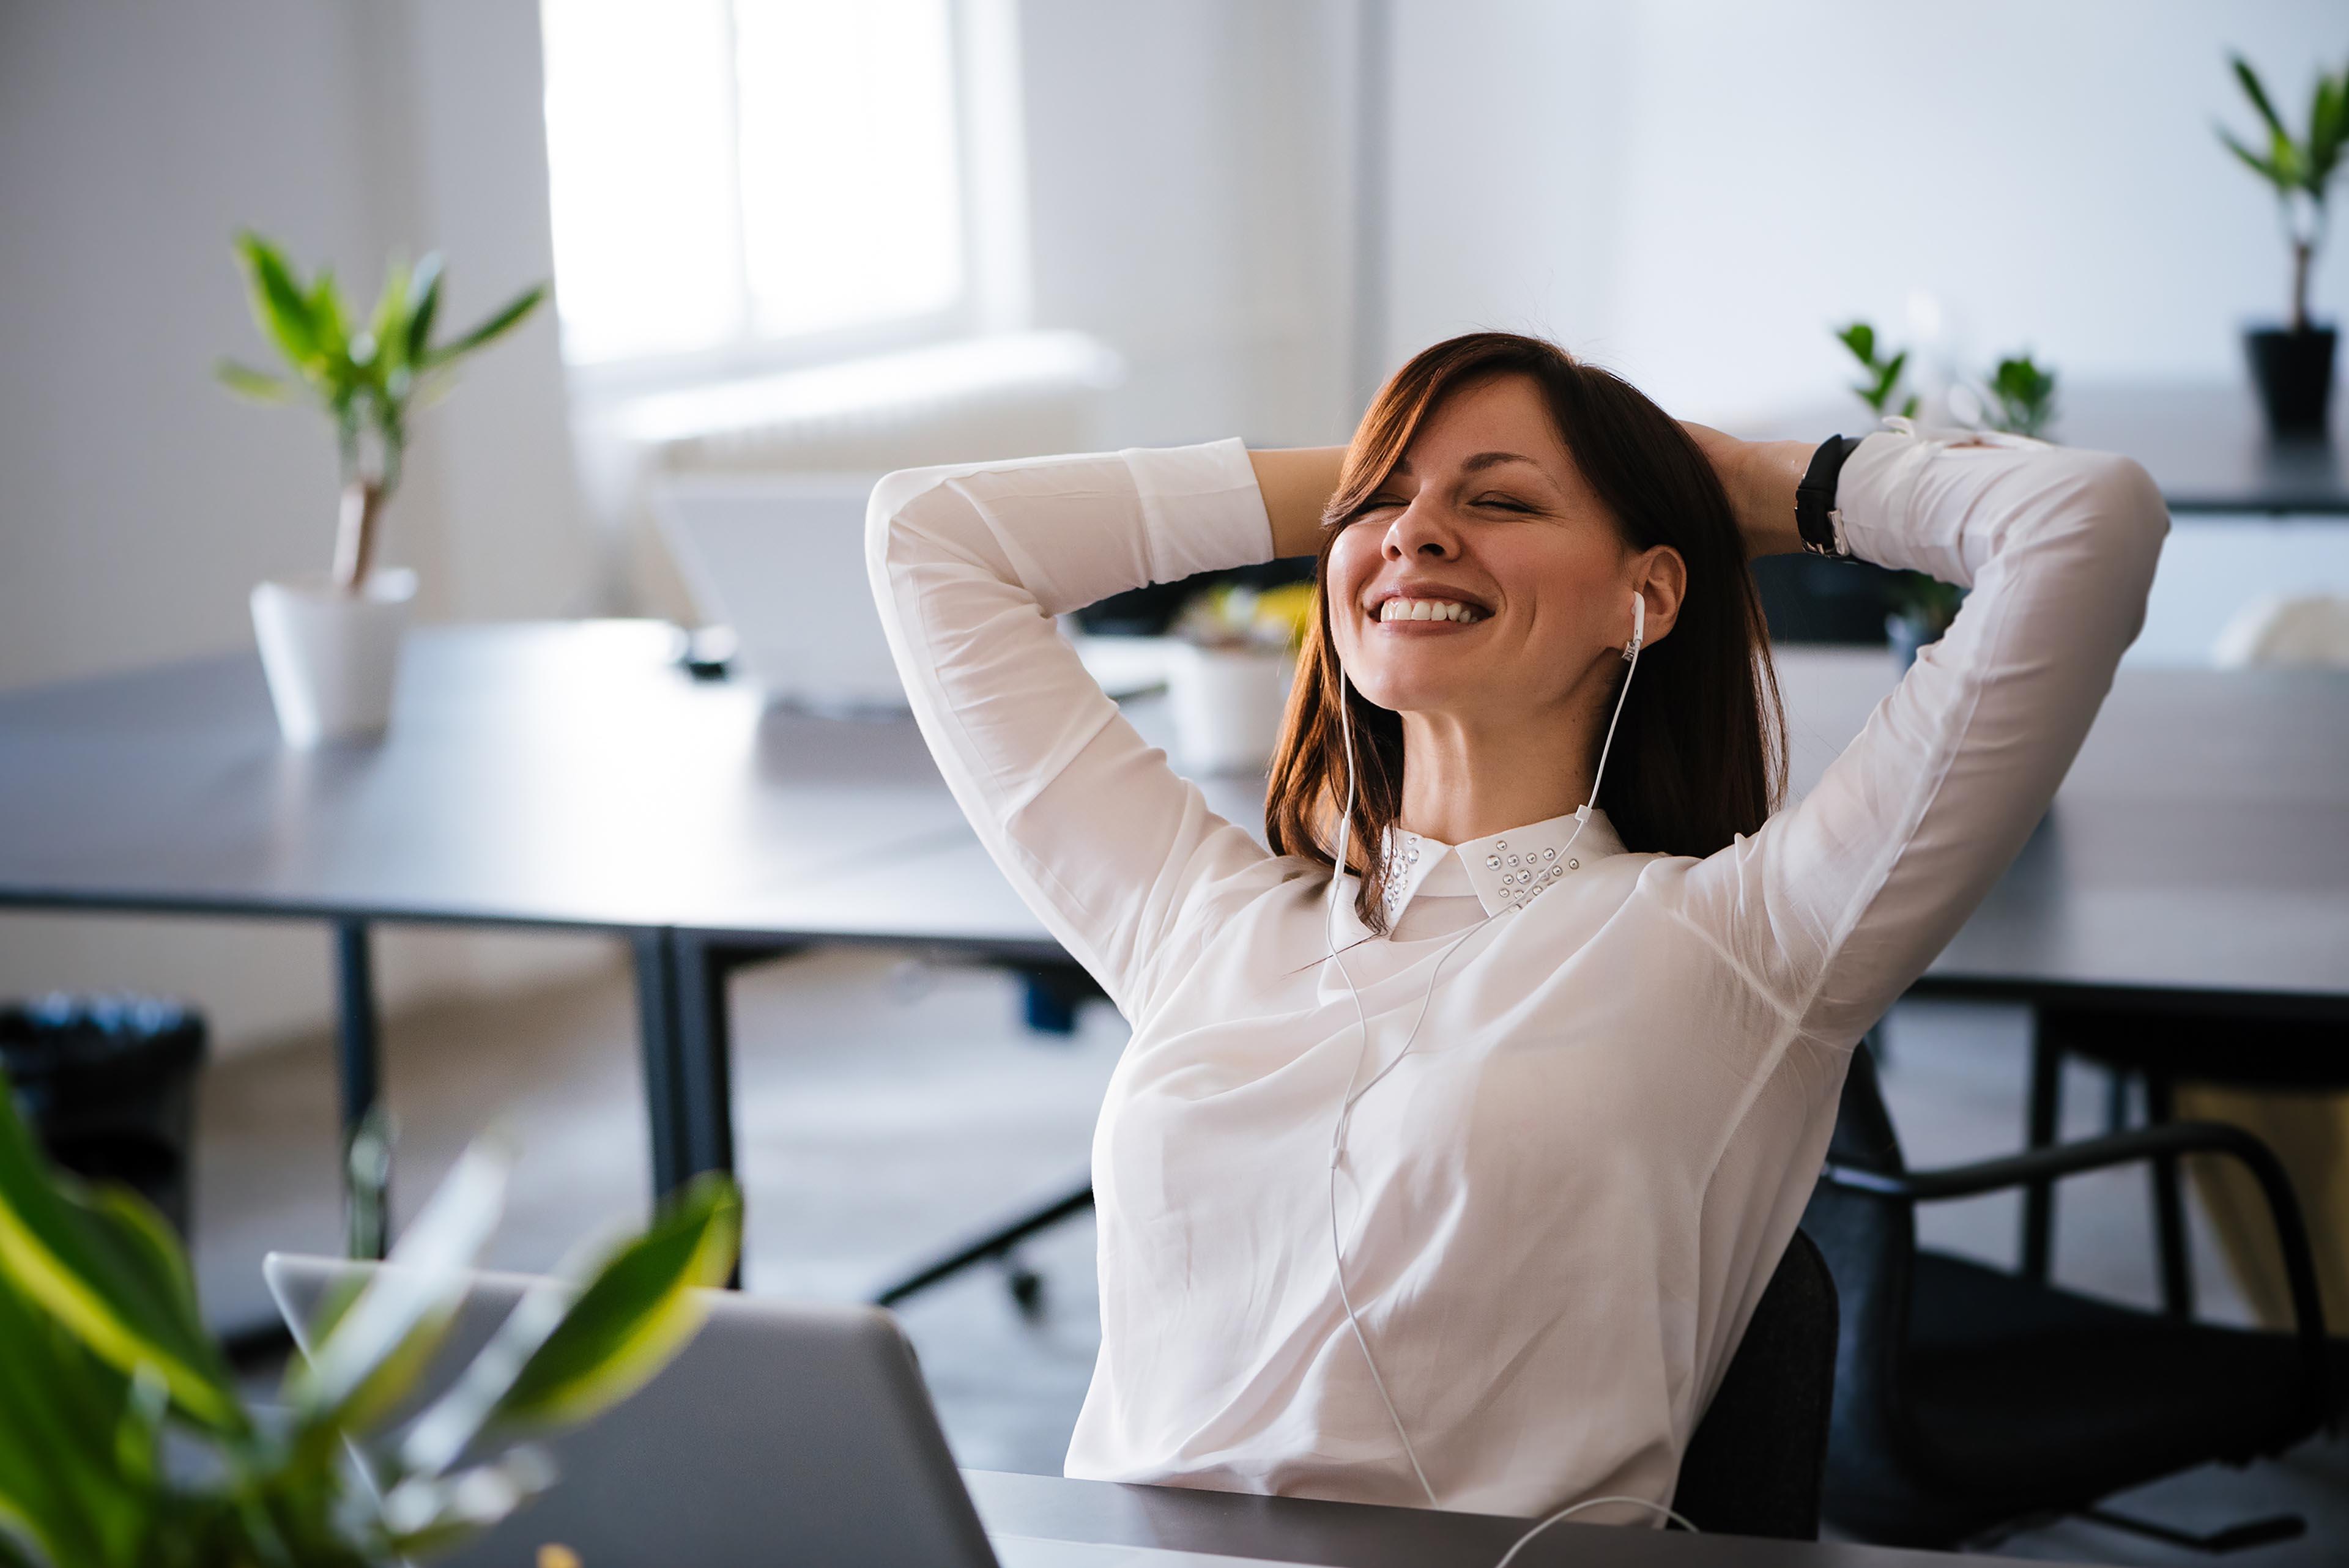 wermke bürokonzepte | Arbeitsplatz mit Freude